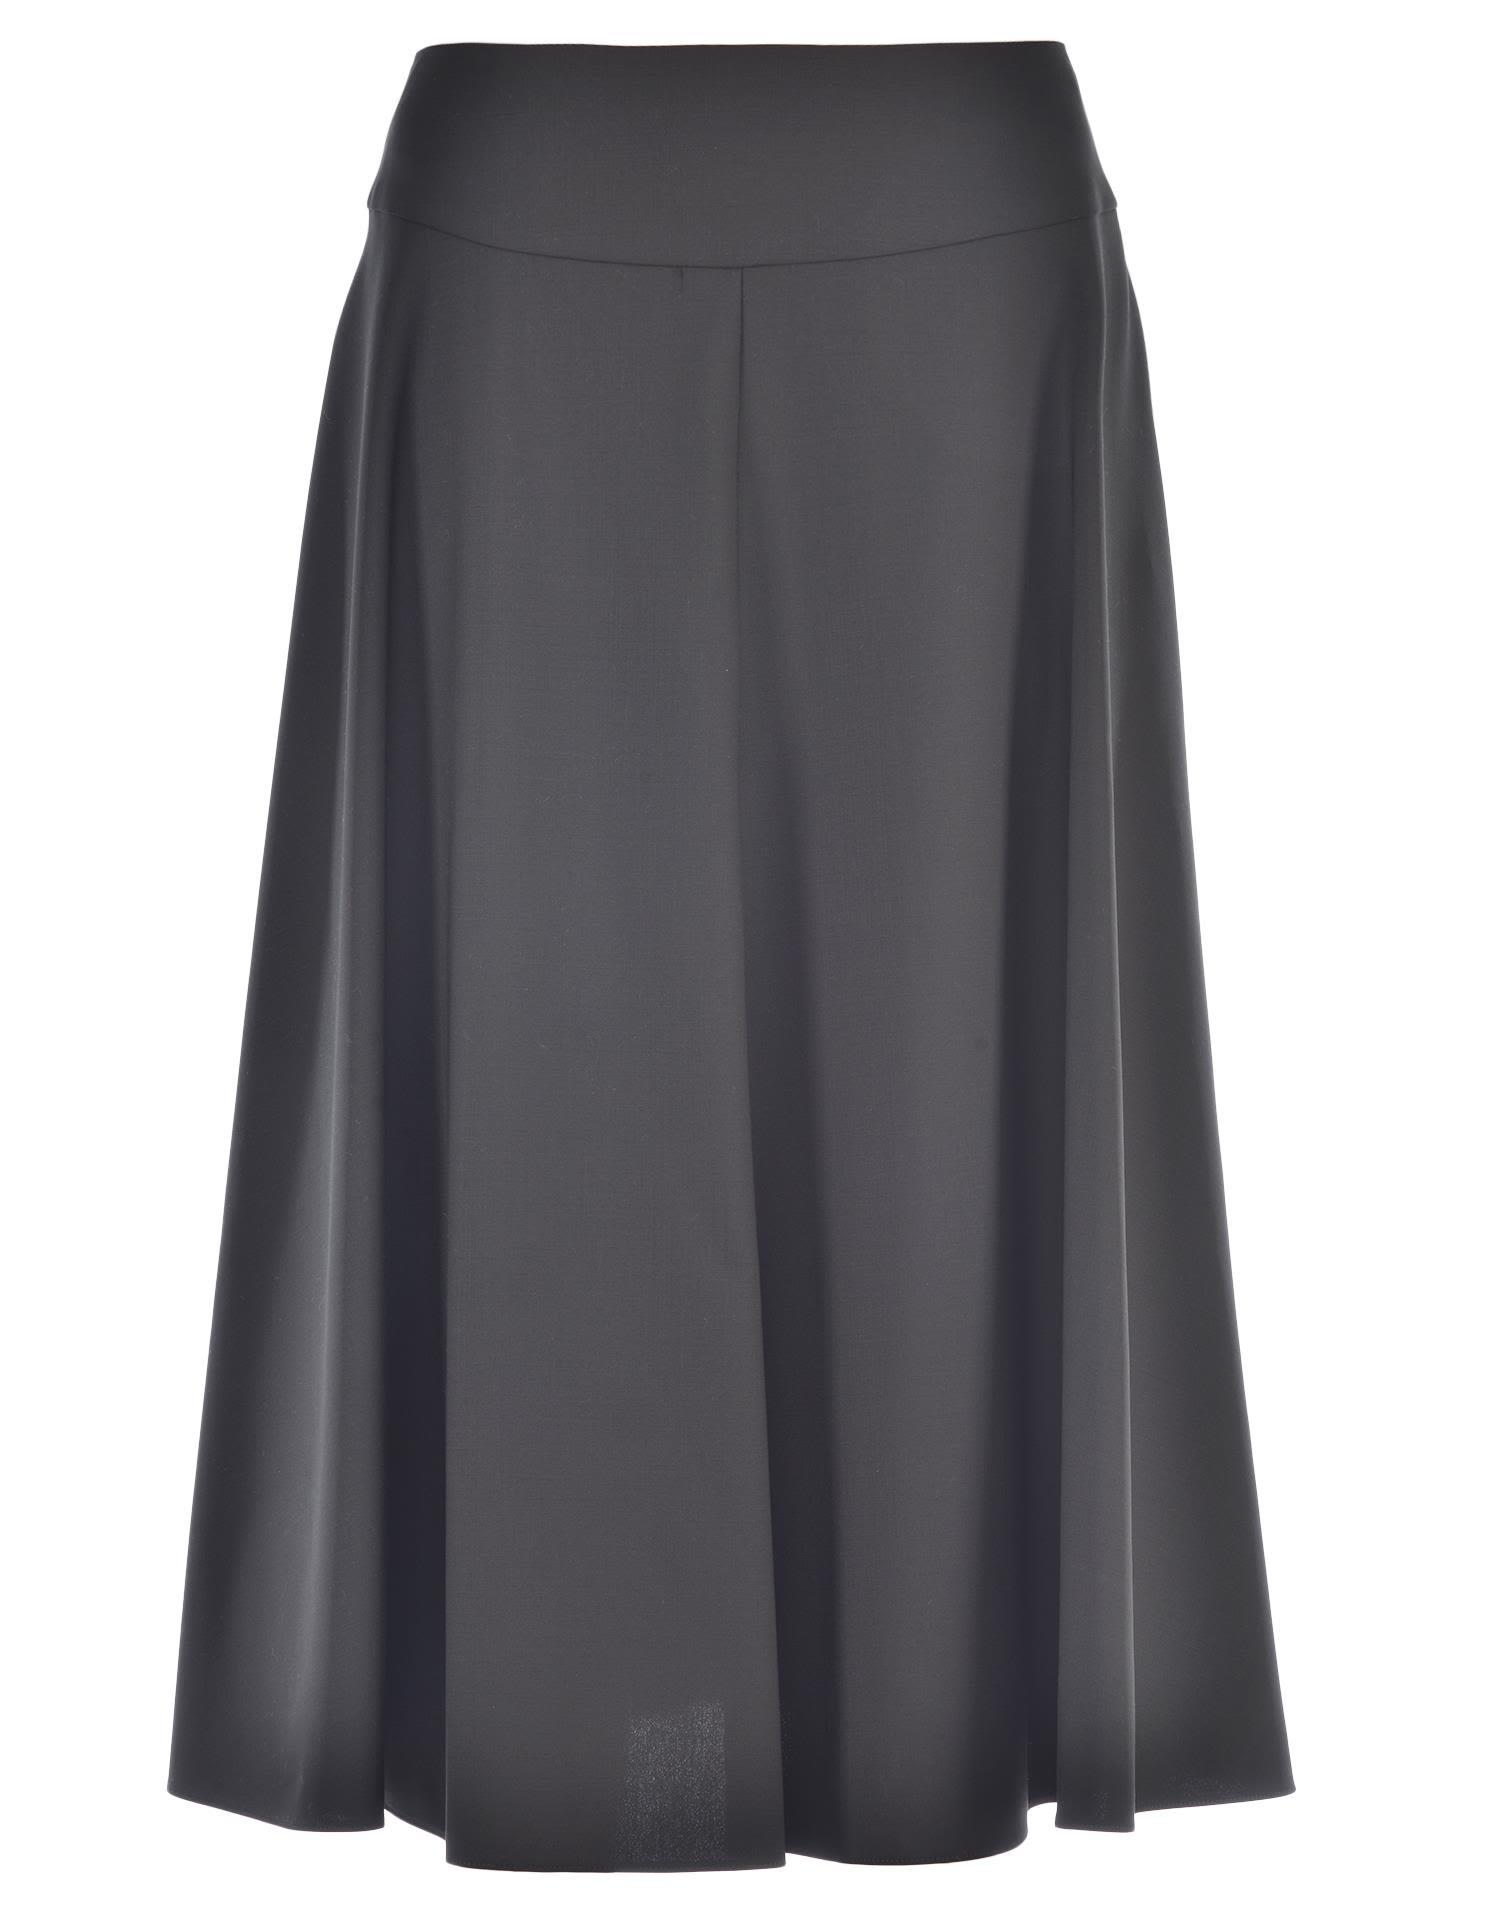 Jil Sander Wool Skirt